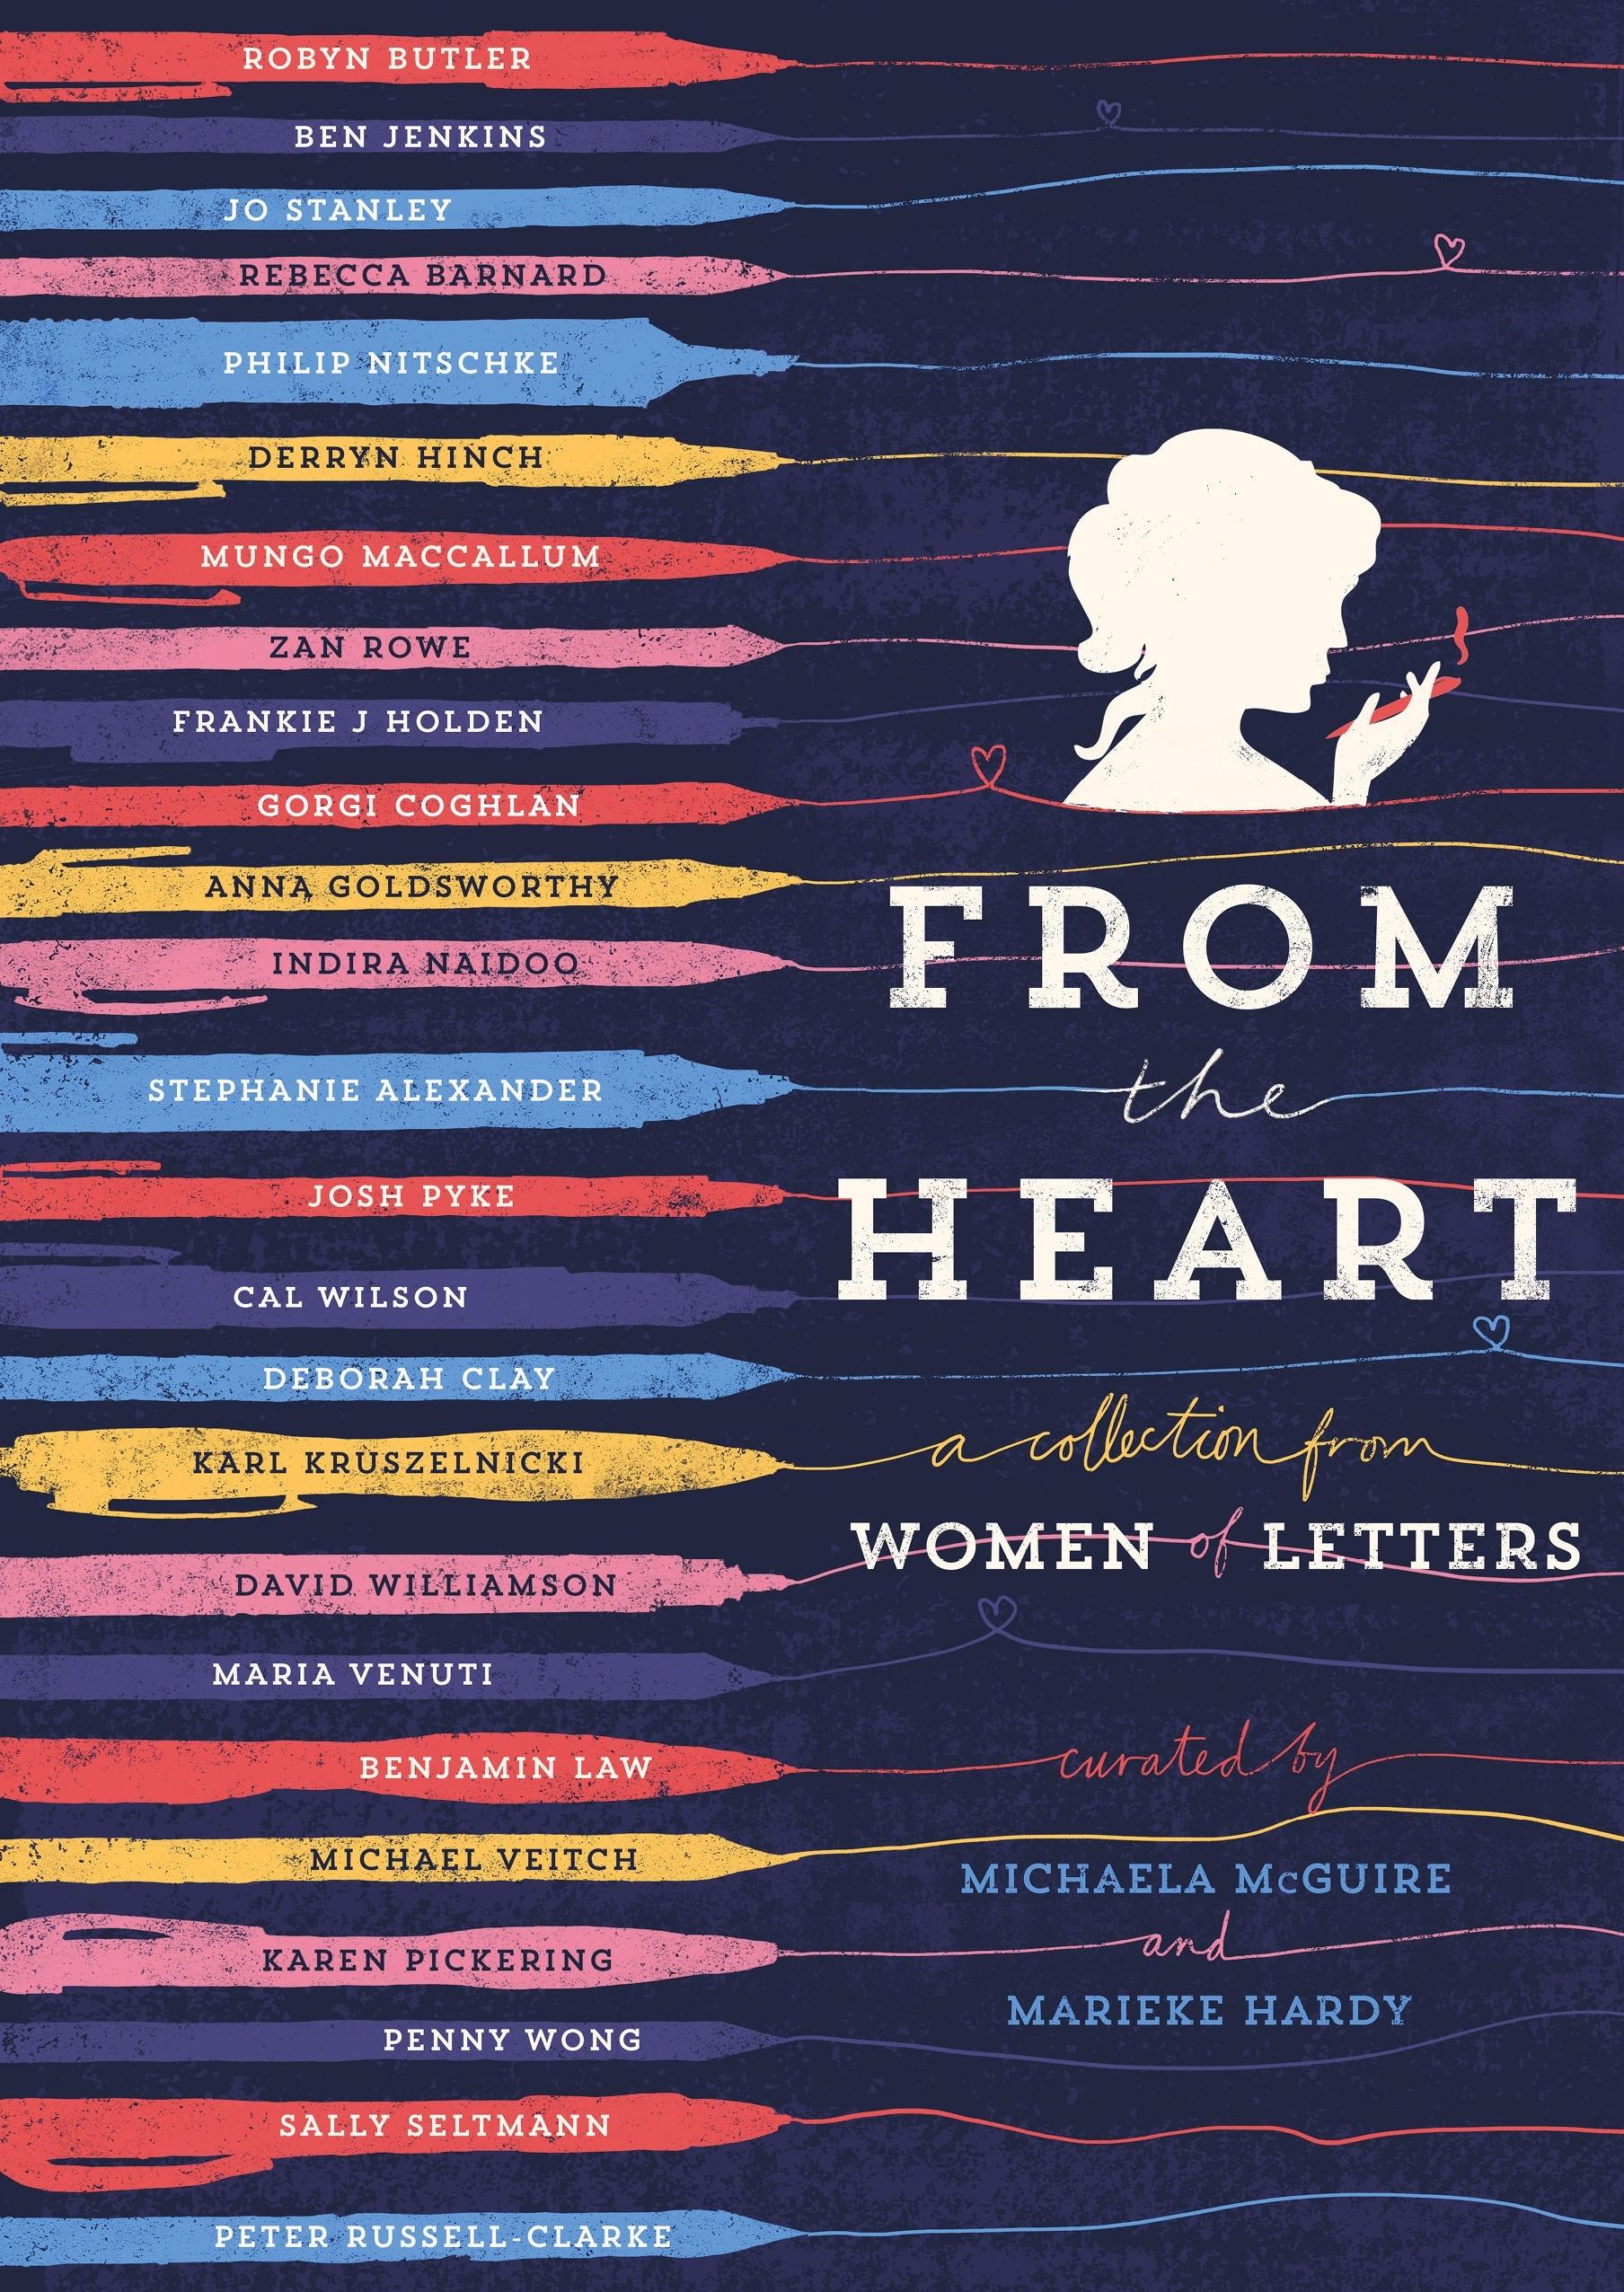 From The Heart: WomenOfLetters